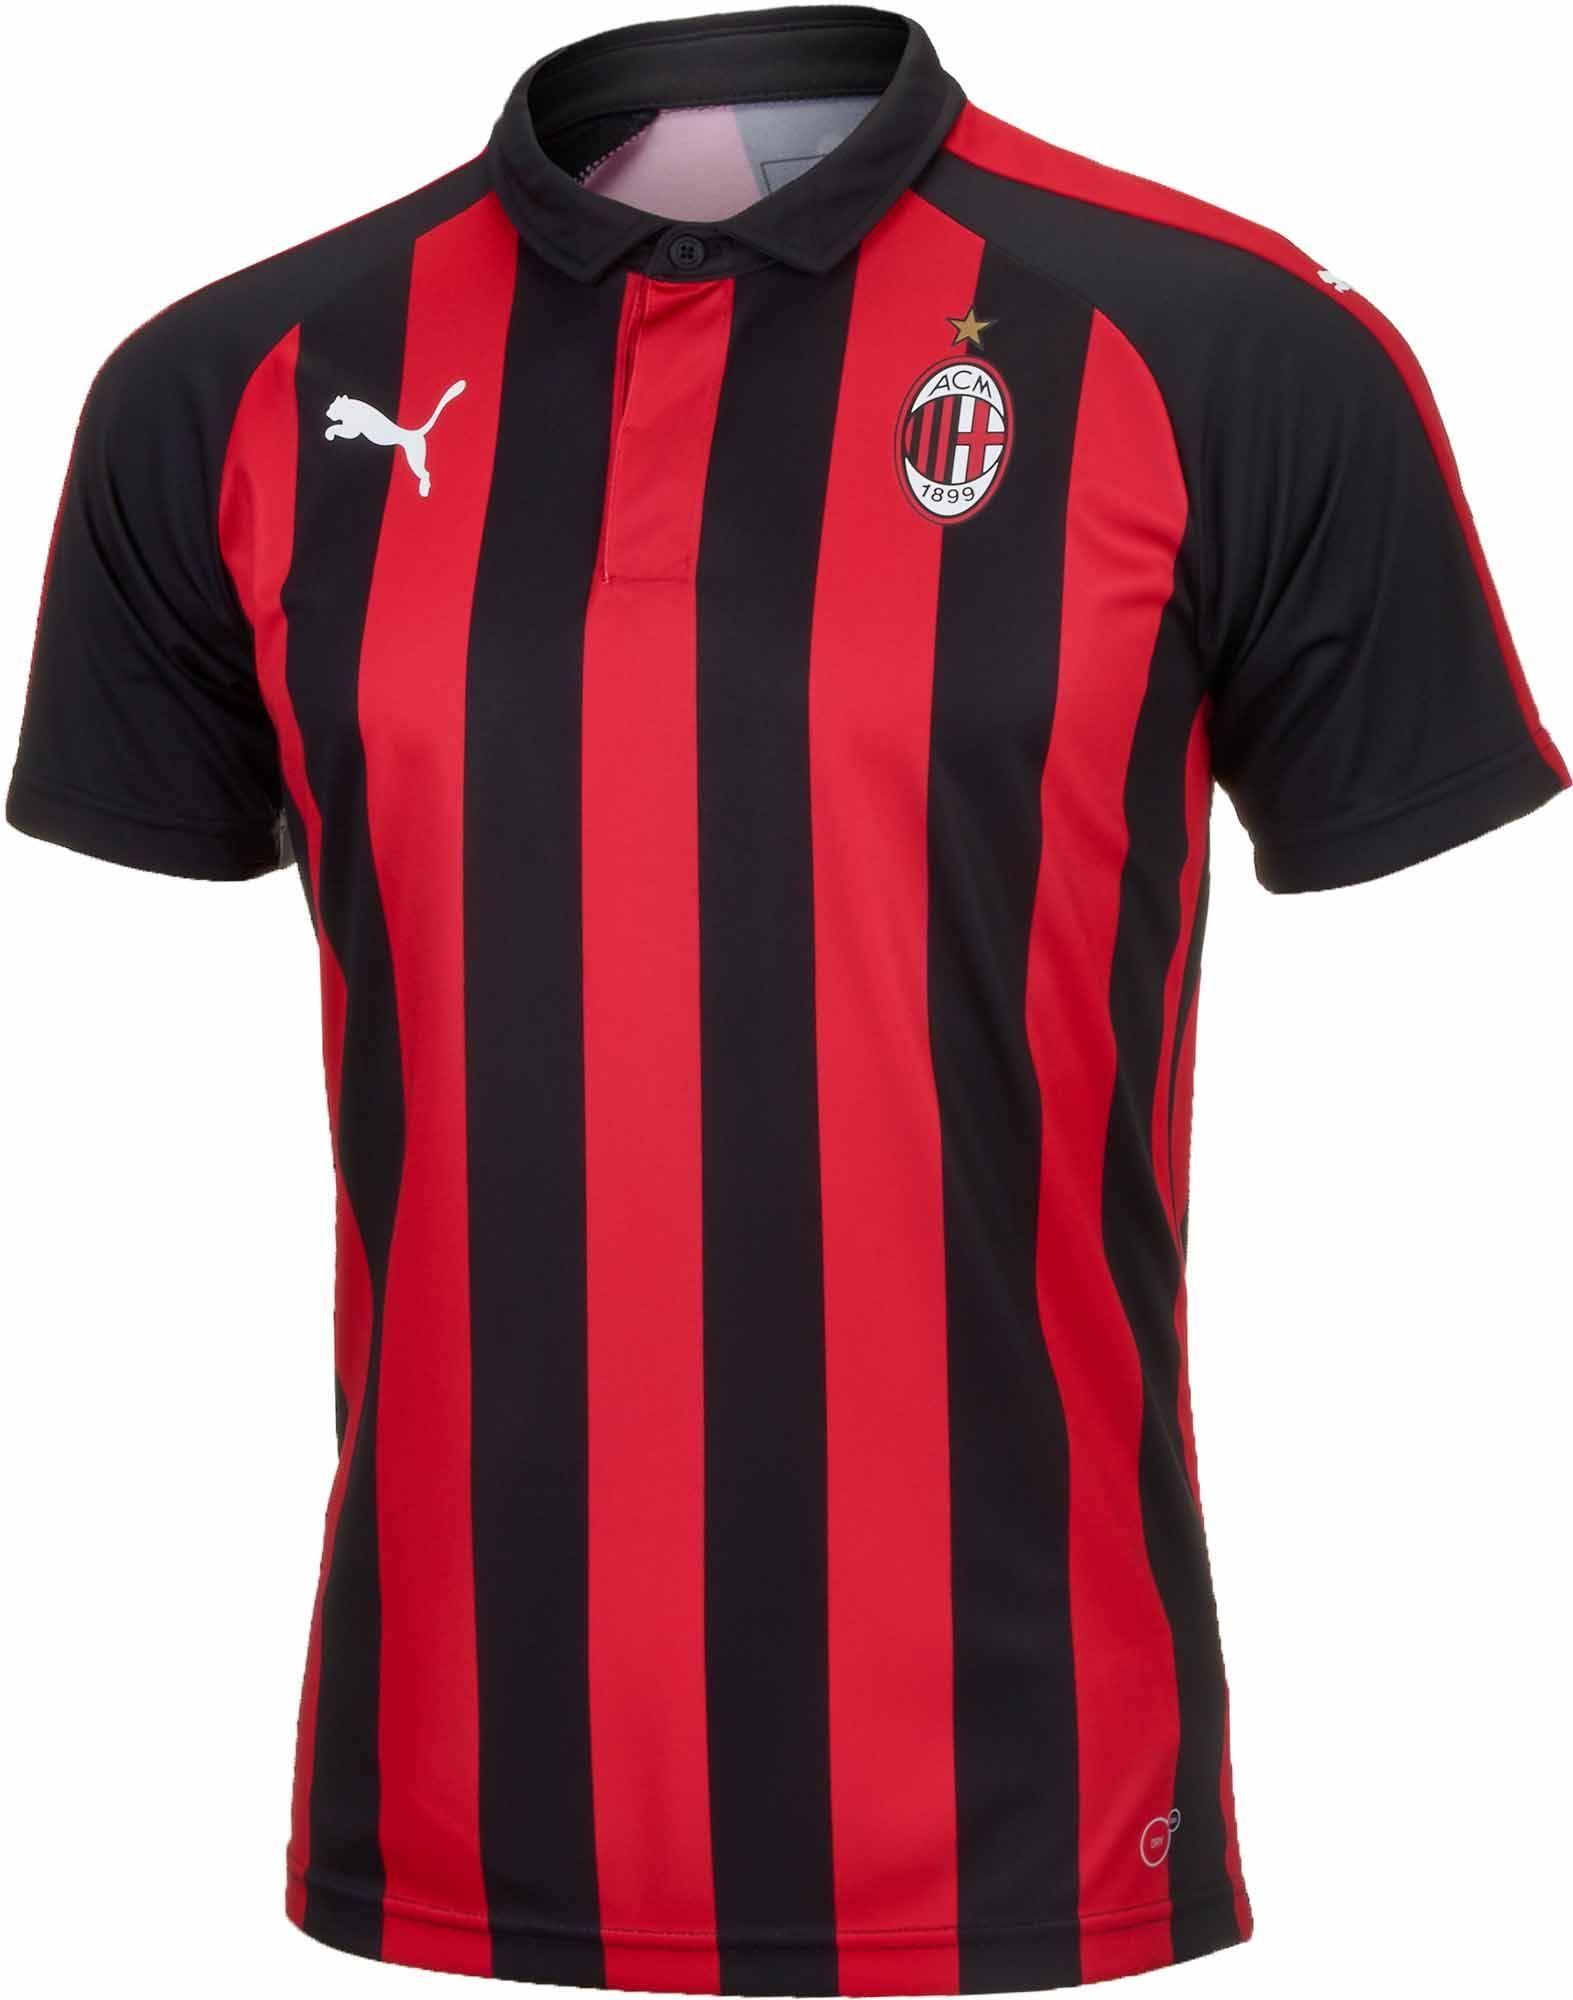 buy Custom Cheap Soccer Jerseys Shirts ,soccer cleat